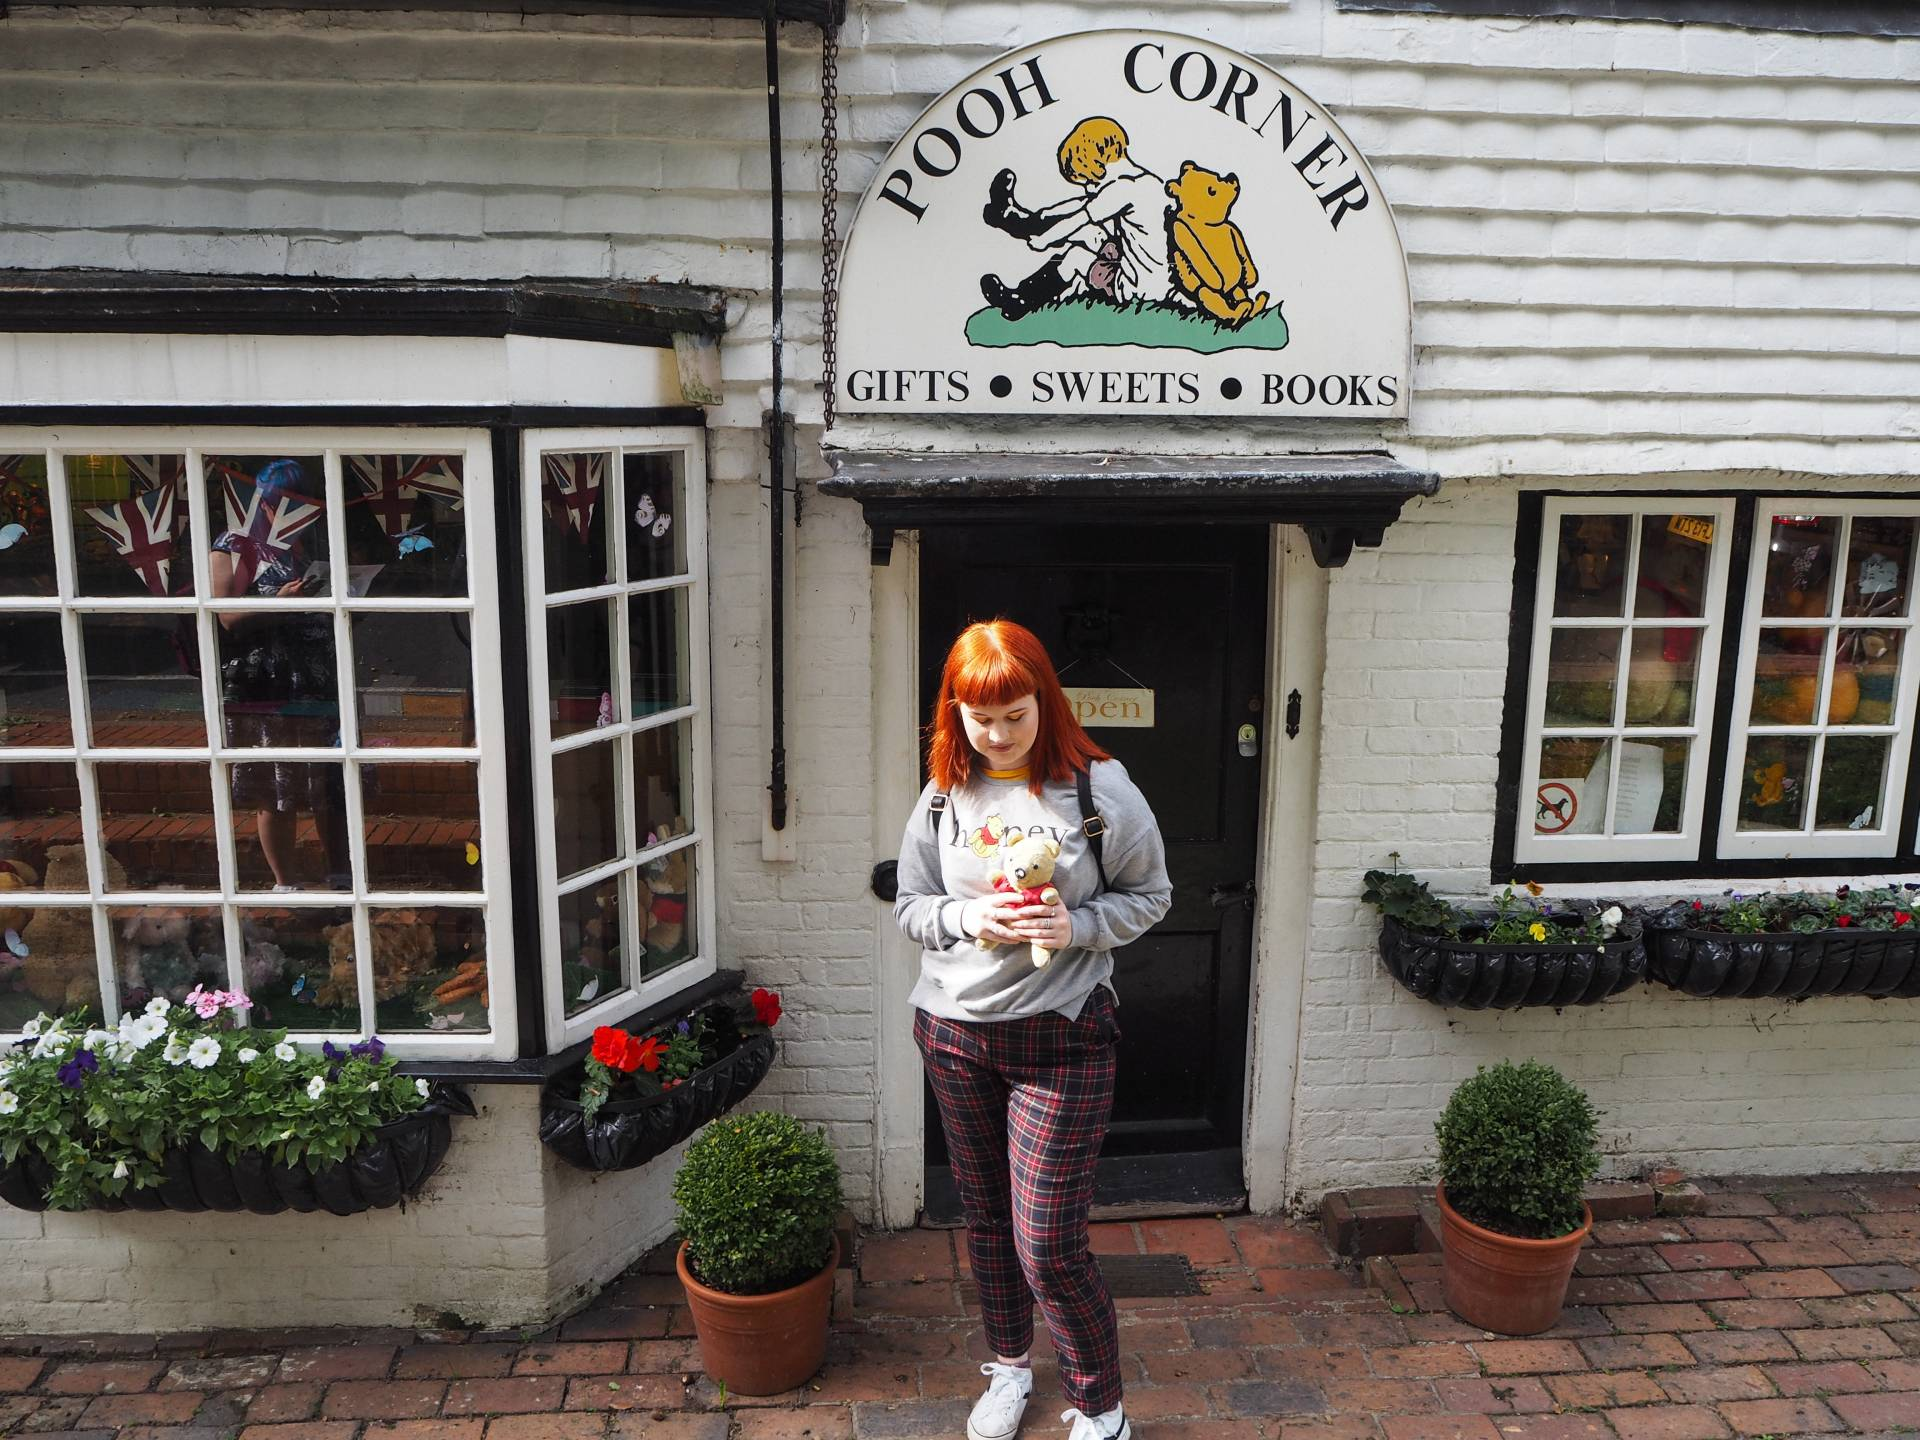 Pooh Corner, Hartfield